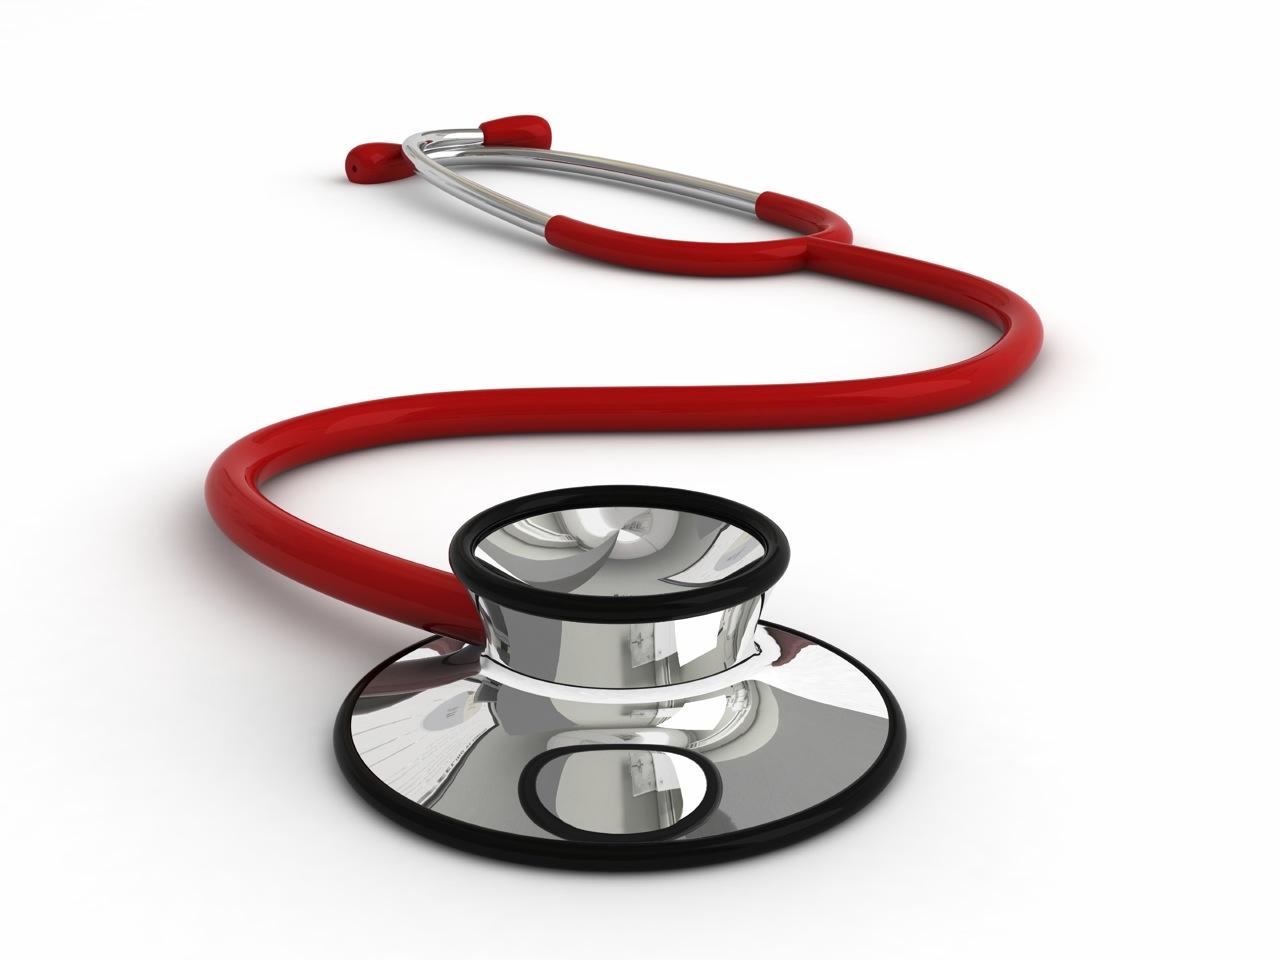 PIX.crec.new fac campaign.stethoscope.small.istock.spr09.jpg